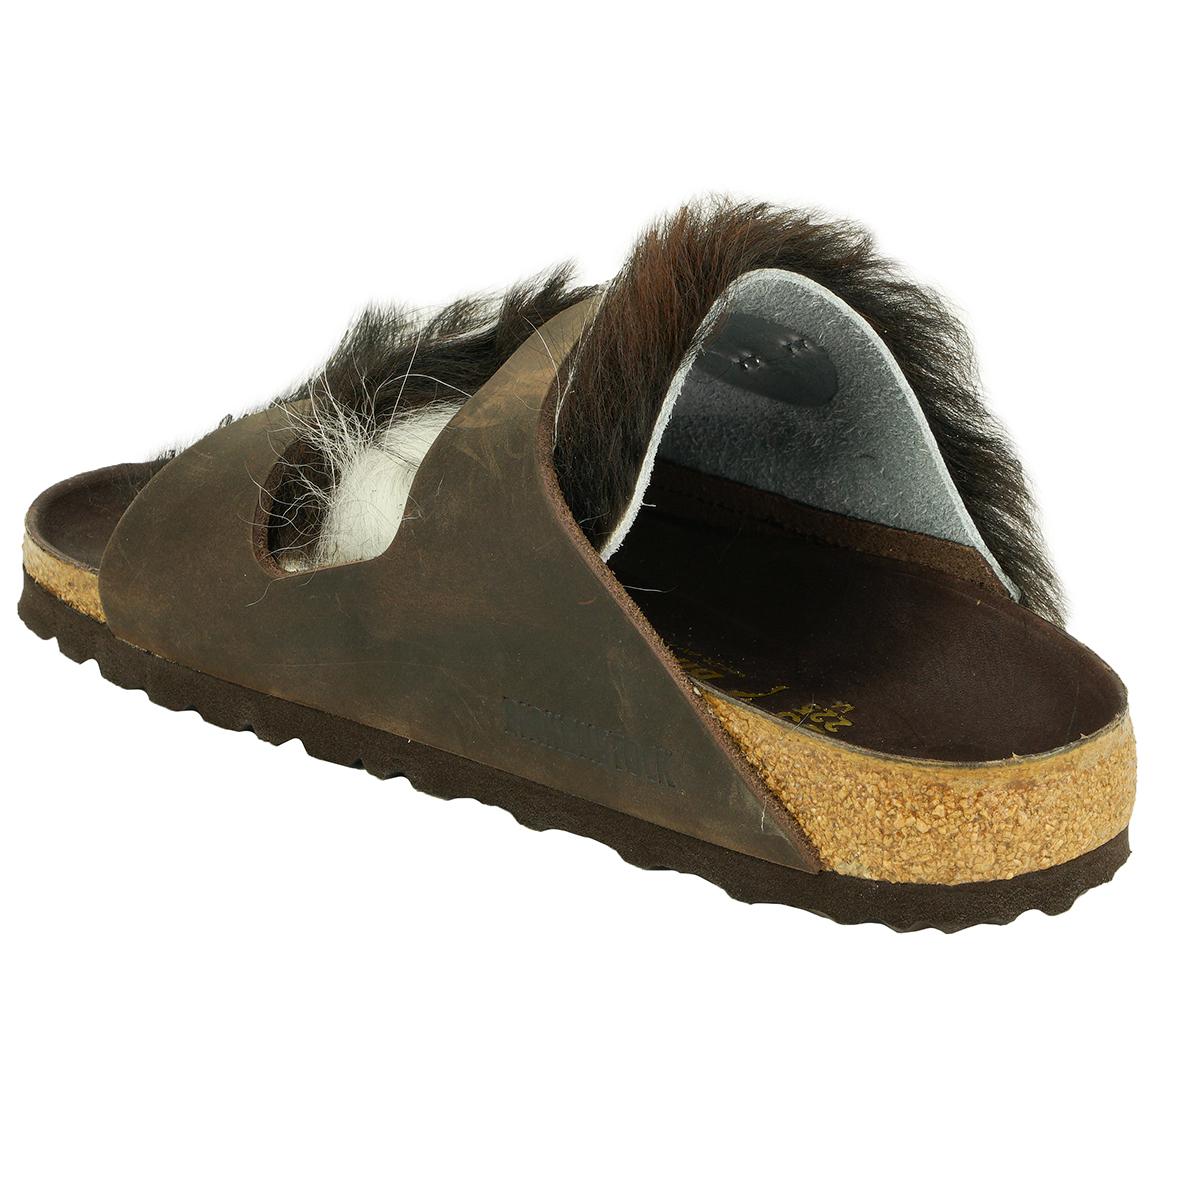 Birkenstock-Arizona-Sandals thumbnail 18